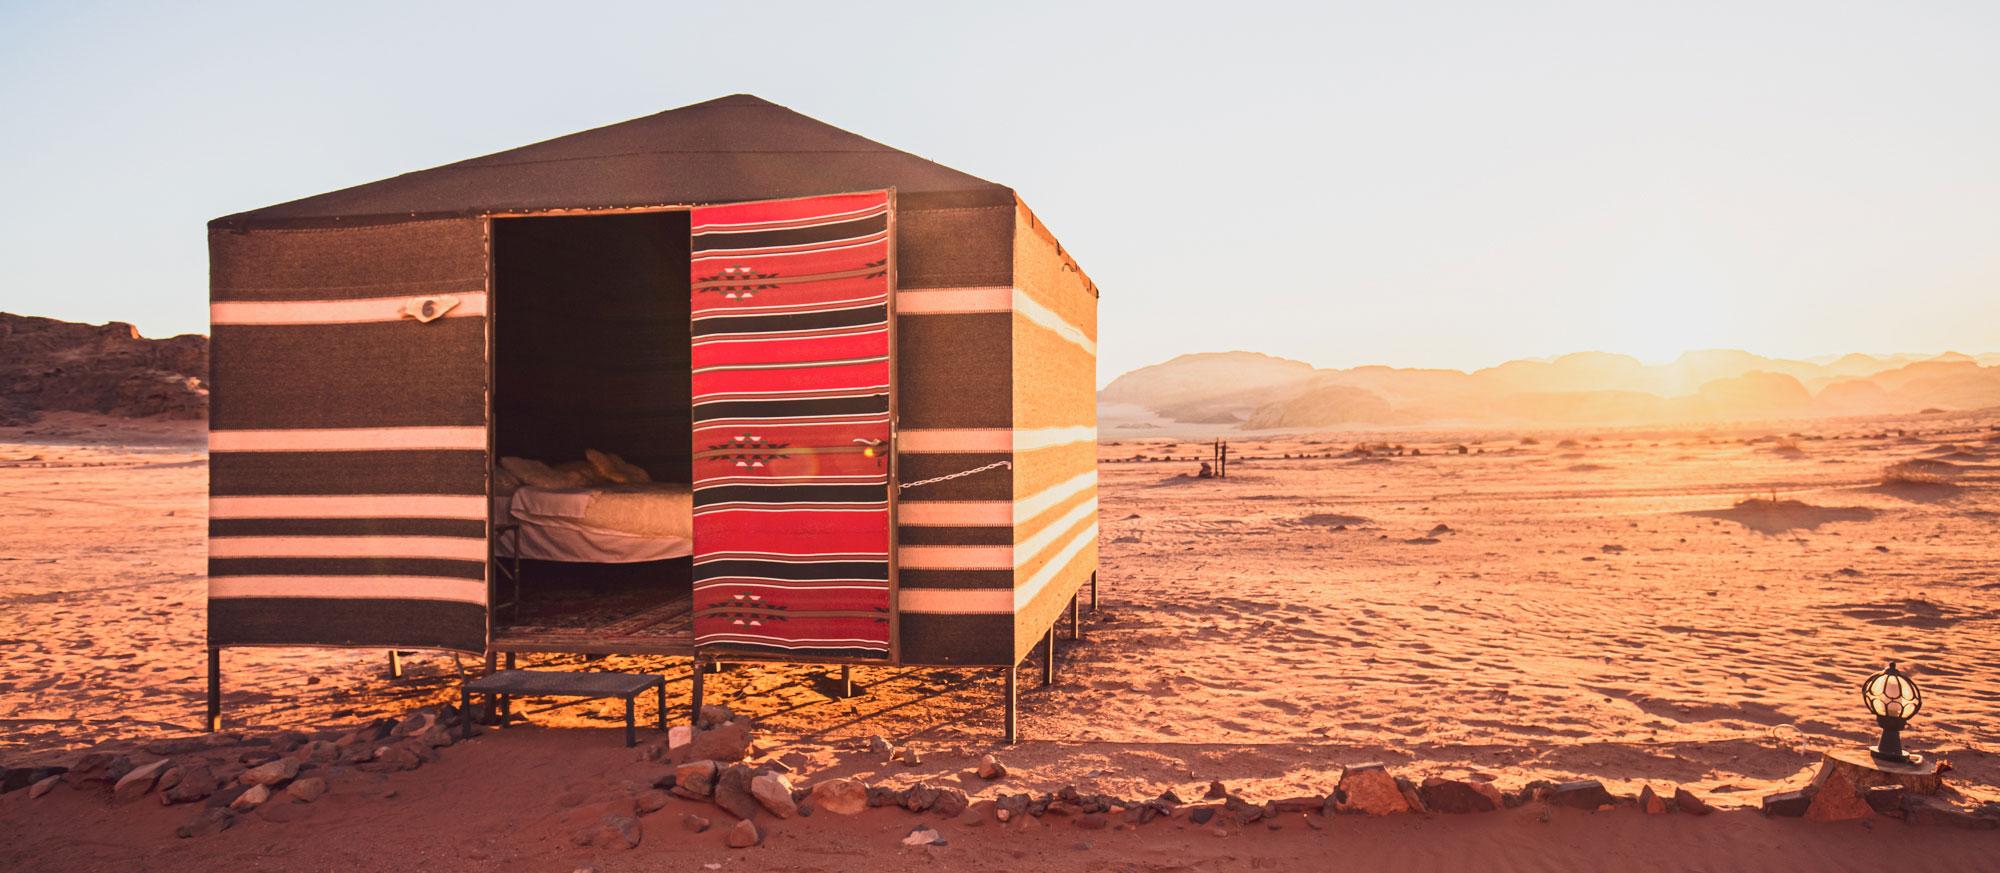 voyage en Jordanie Wadi Rum camp bédouin